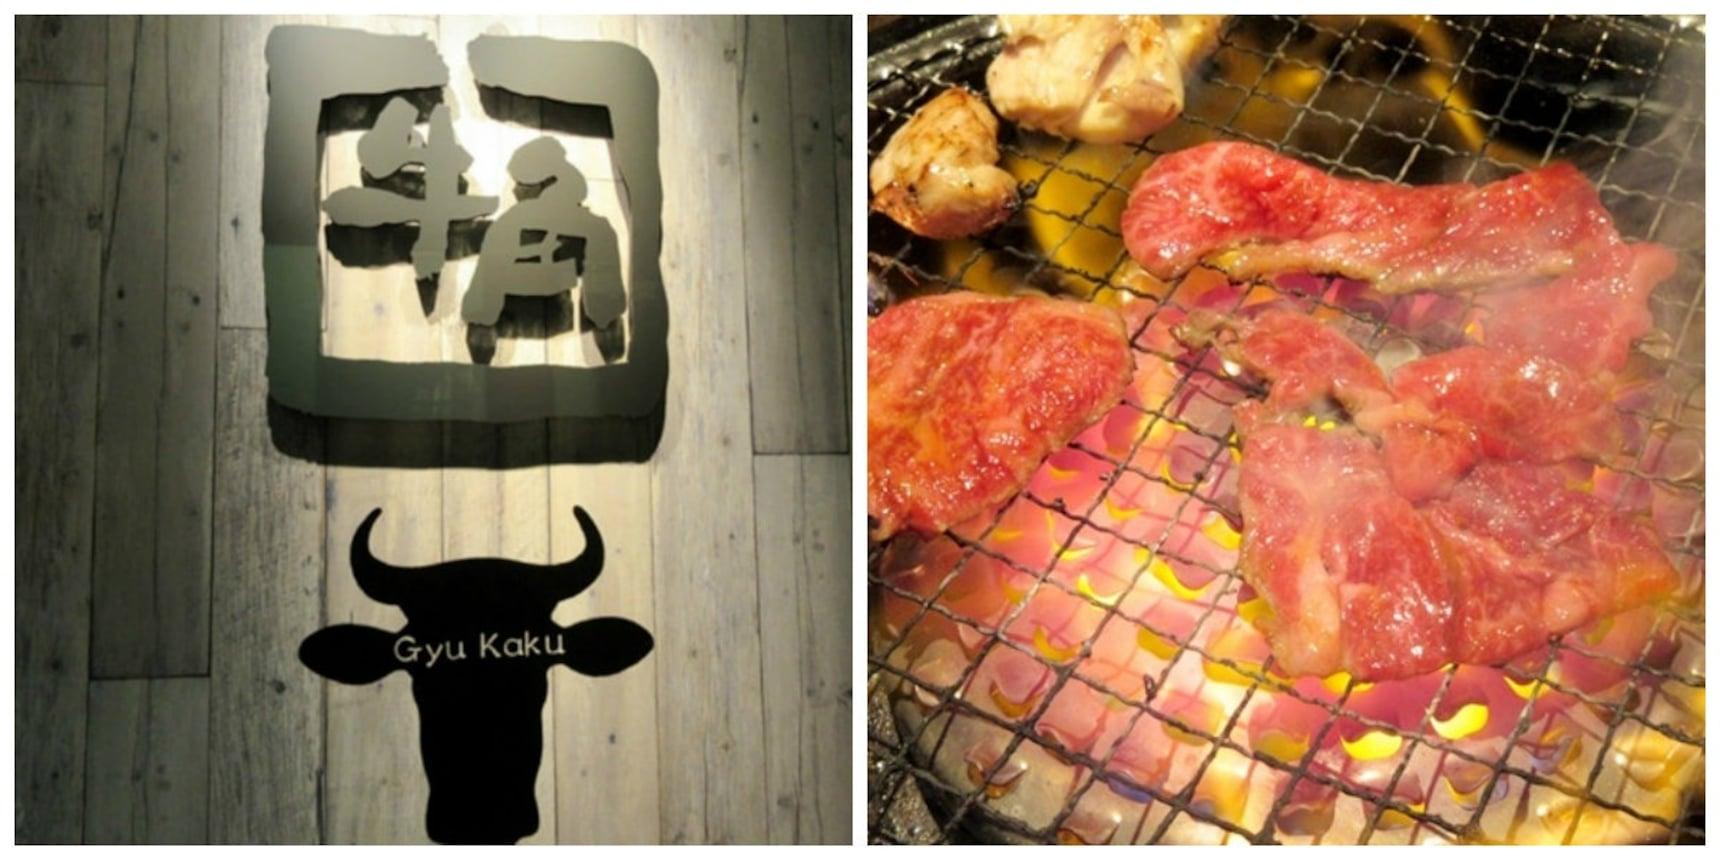 Yakiniku Restaurant Offers Halal Course Meals